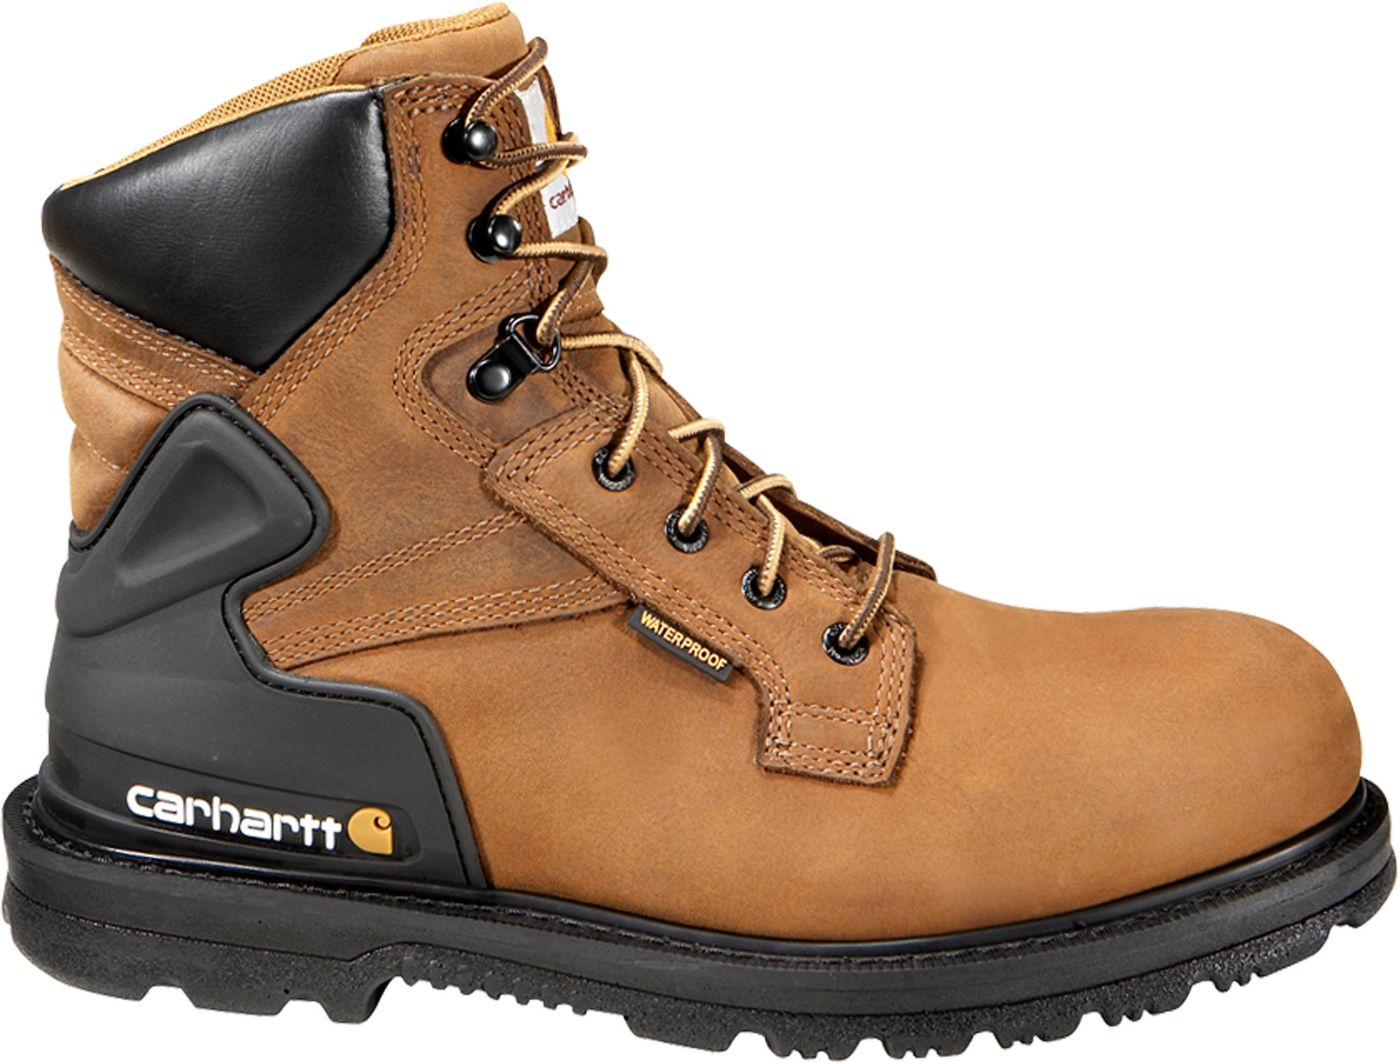 Carhartt Men's Bison Waterproof Safety Toe Work Boots